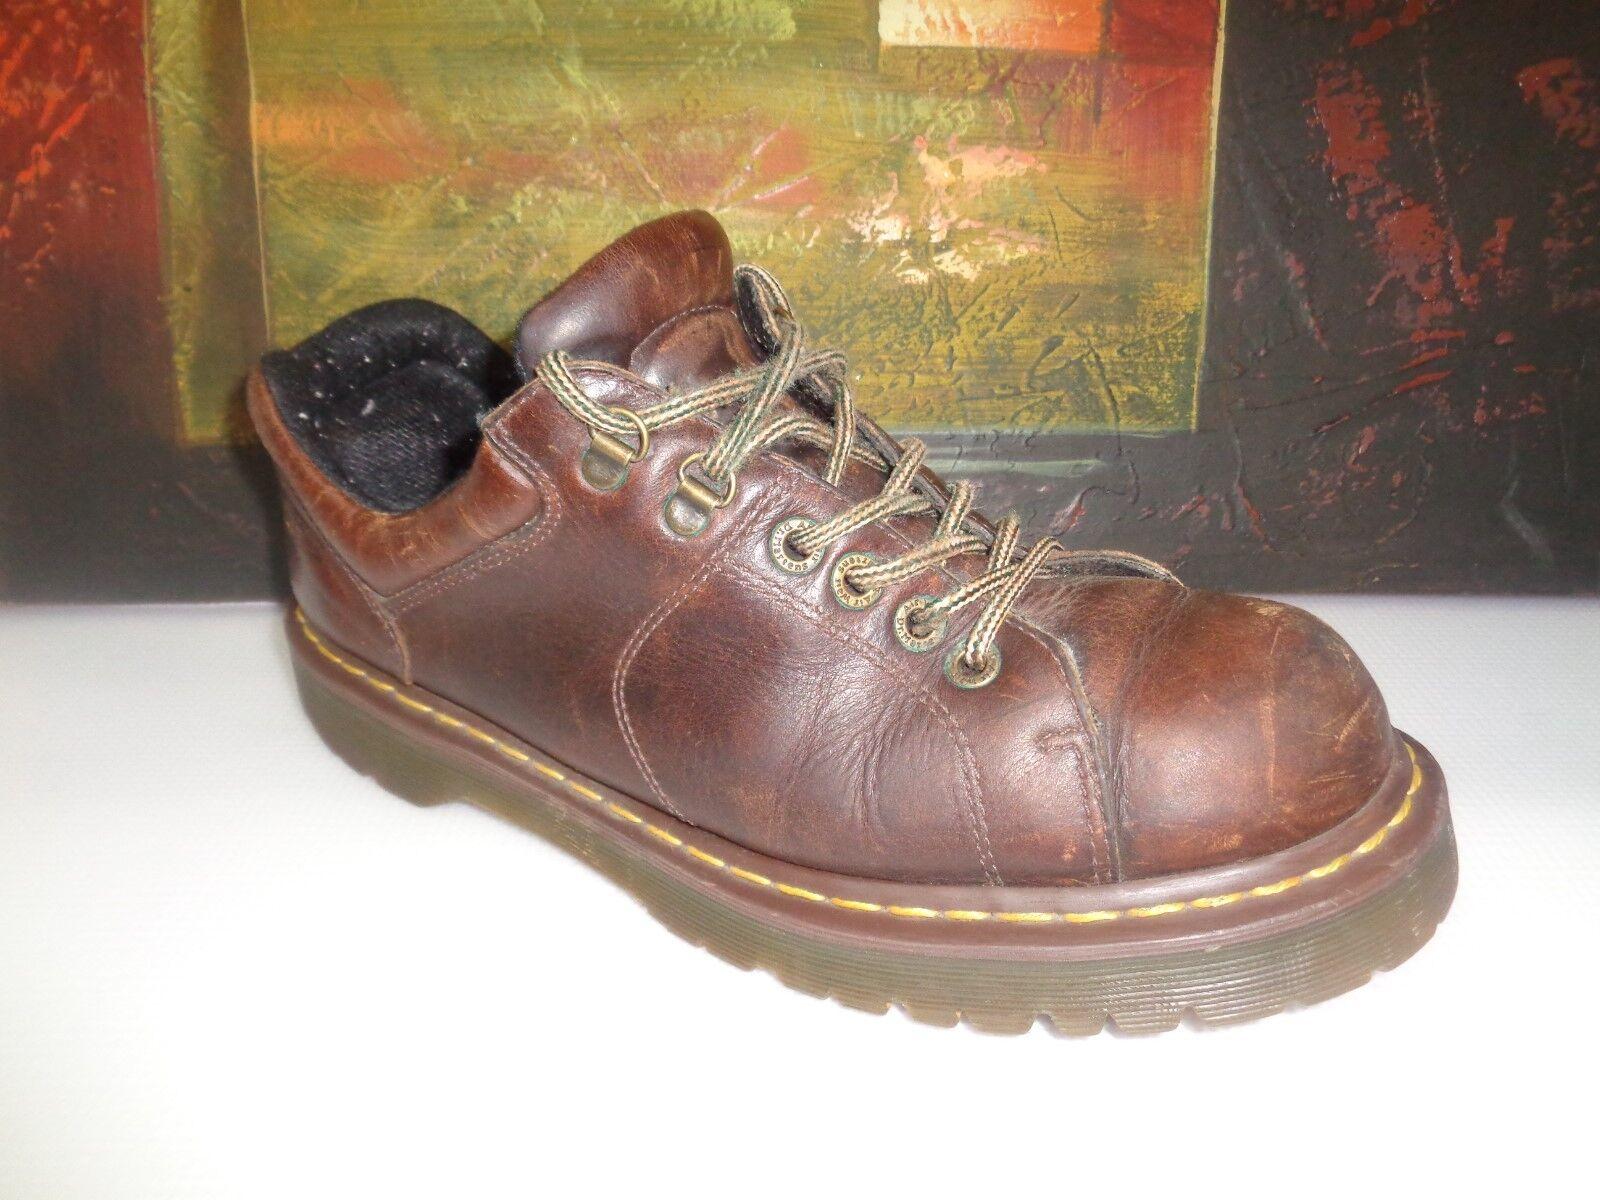 Dr. Martens 8312 AW 004 Brown Men's shoes US Size 13 UK Sz 12 Casual Oxfords